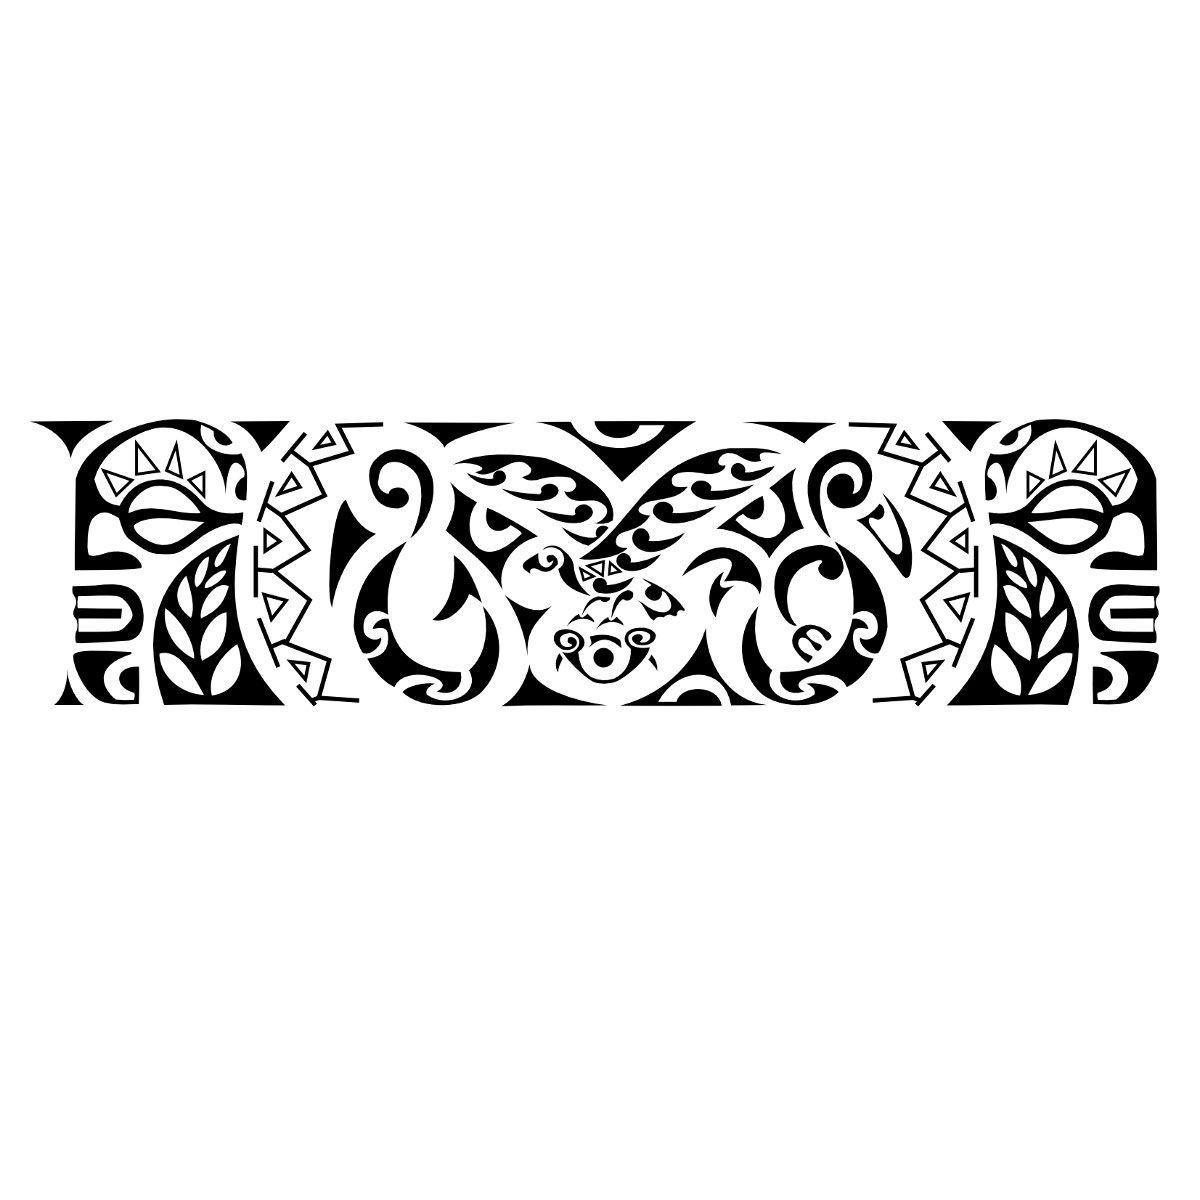 Download Free Blu Sky Tattoo Studio Maori Significato 121 To Use